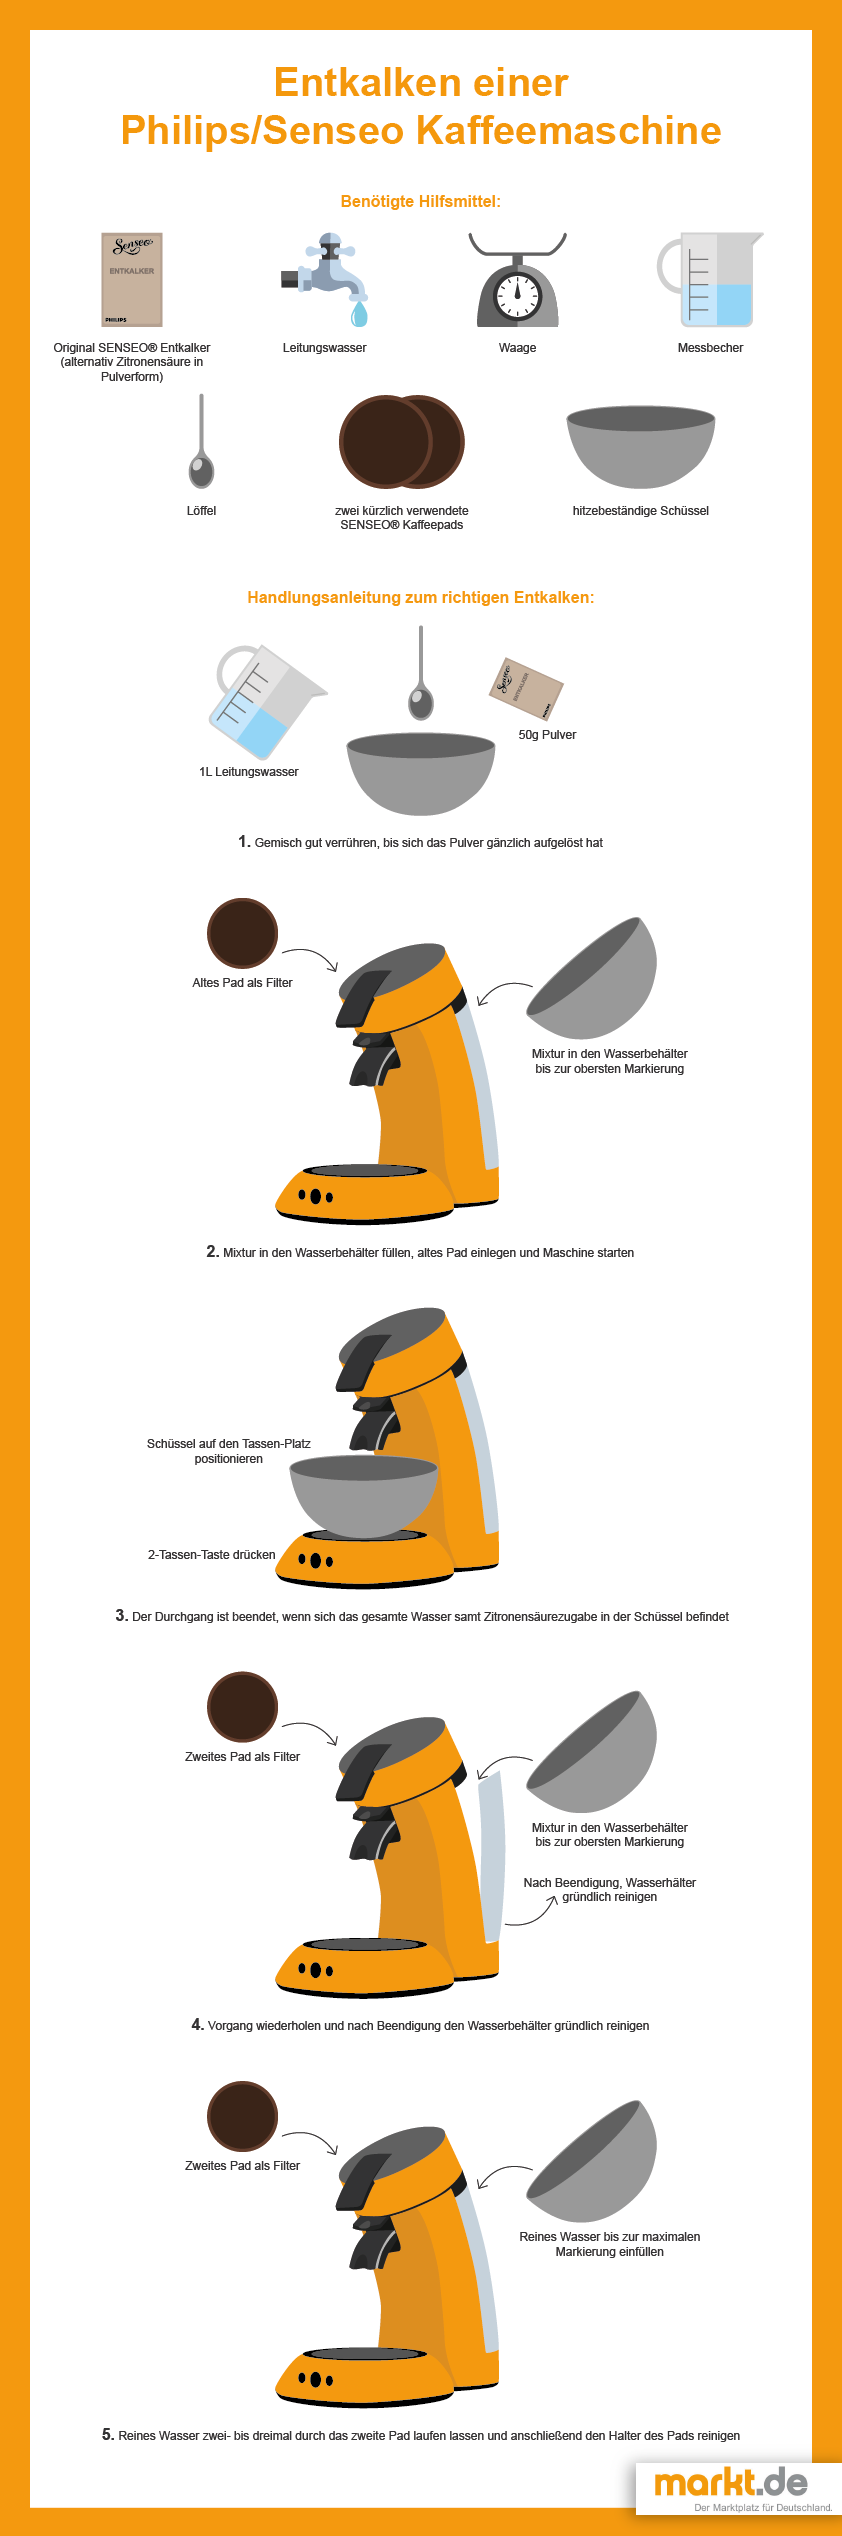 senseo kaffeemaschine reinigen